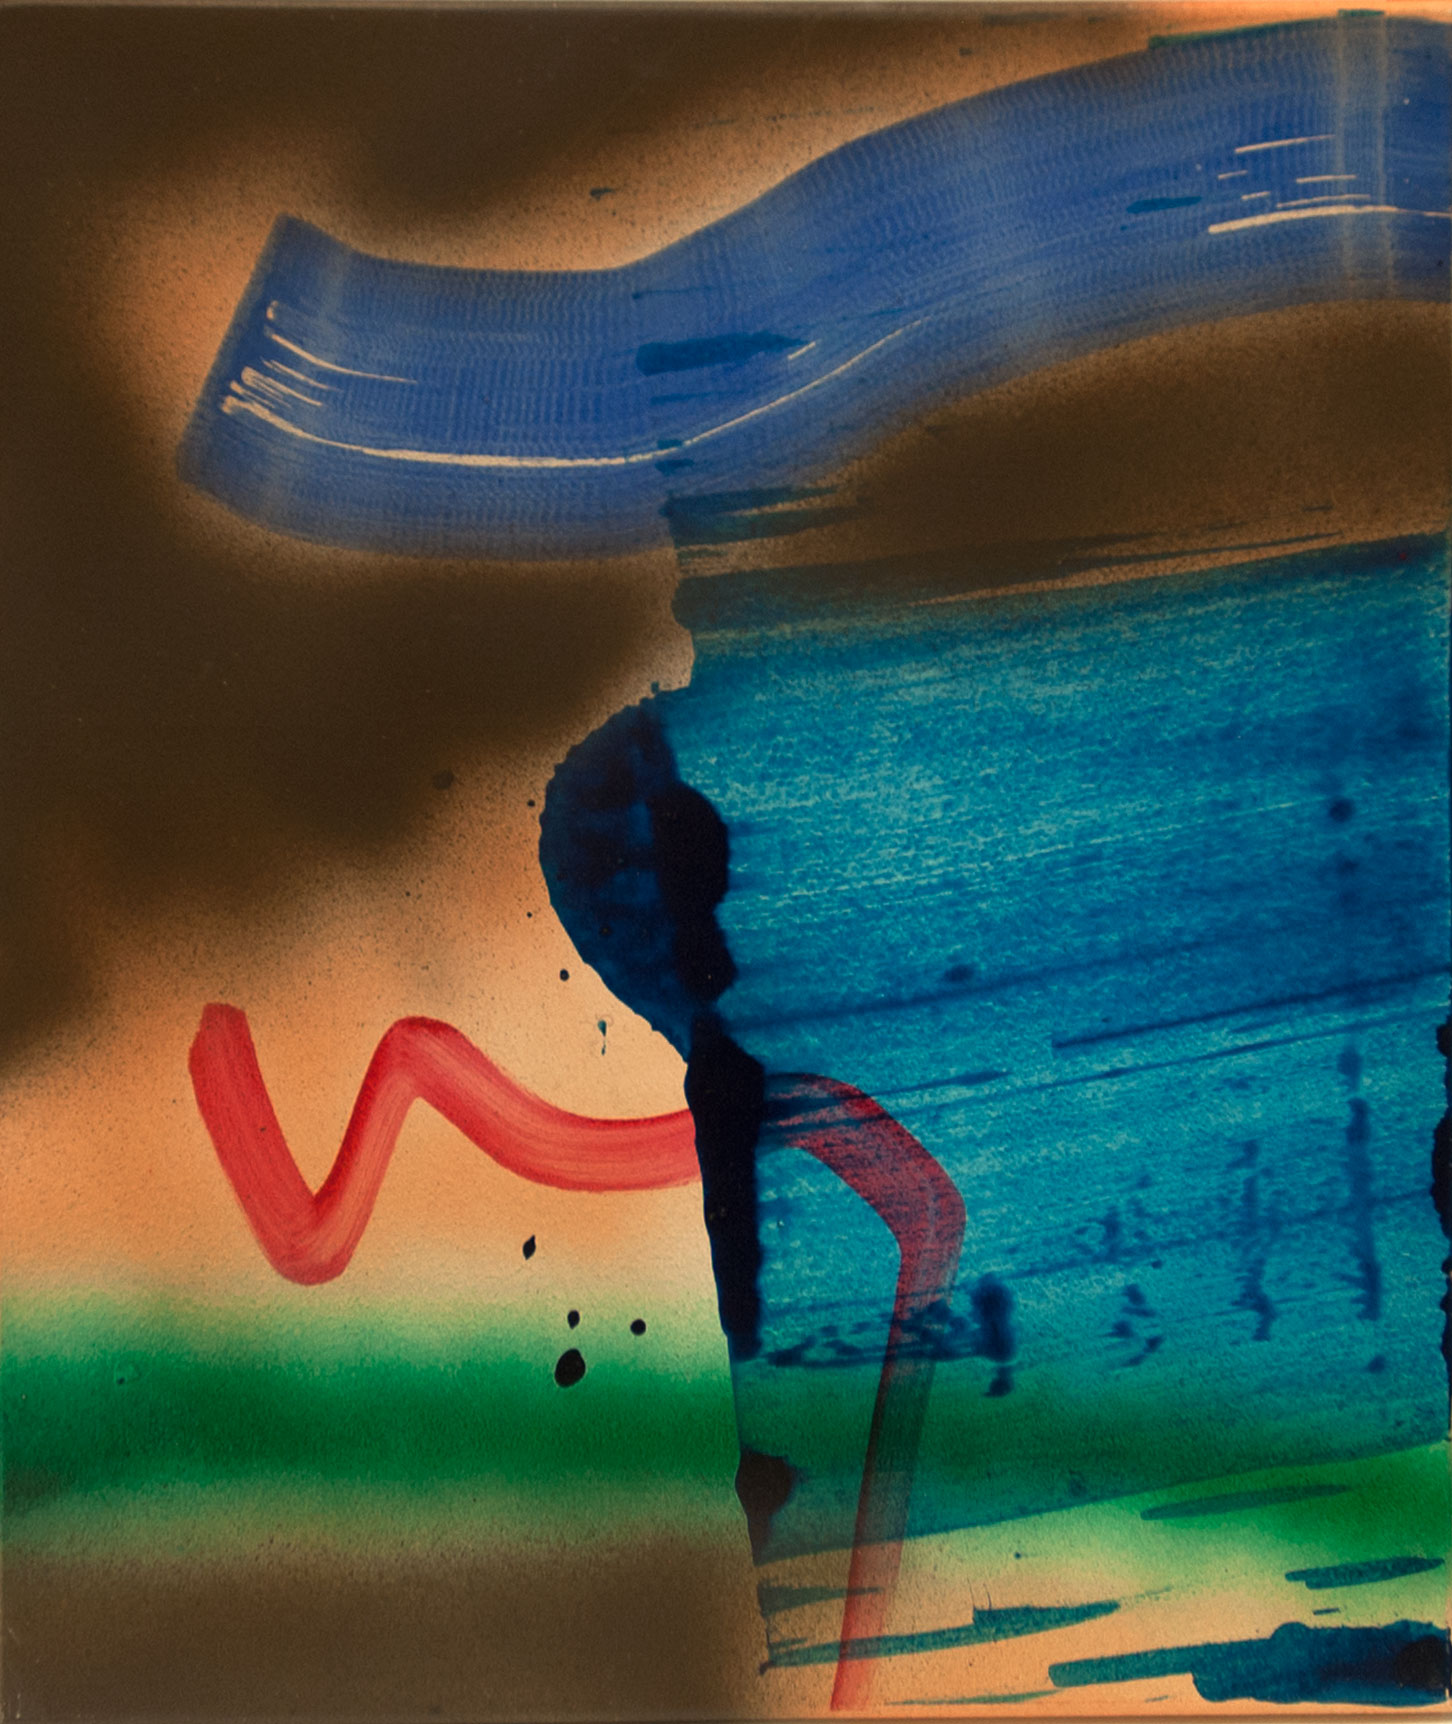 Untitled 3, 2015, acrylic on panel, 14.25 x 12,